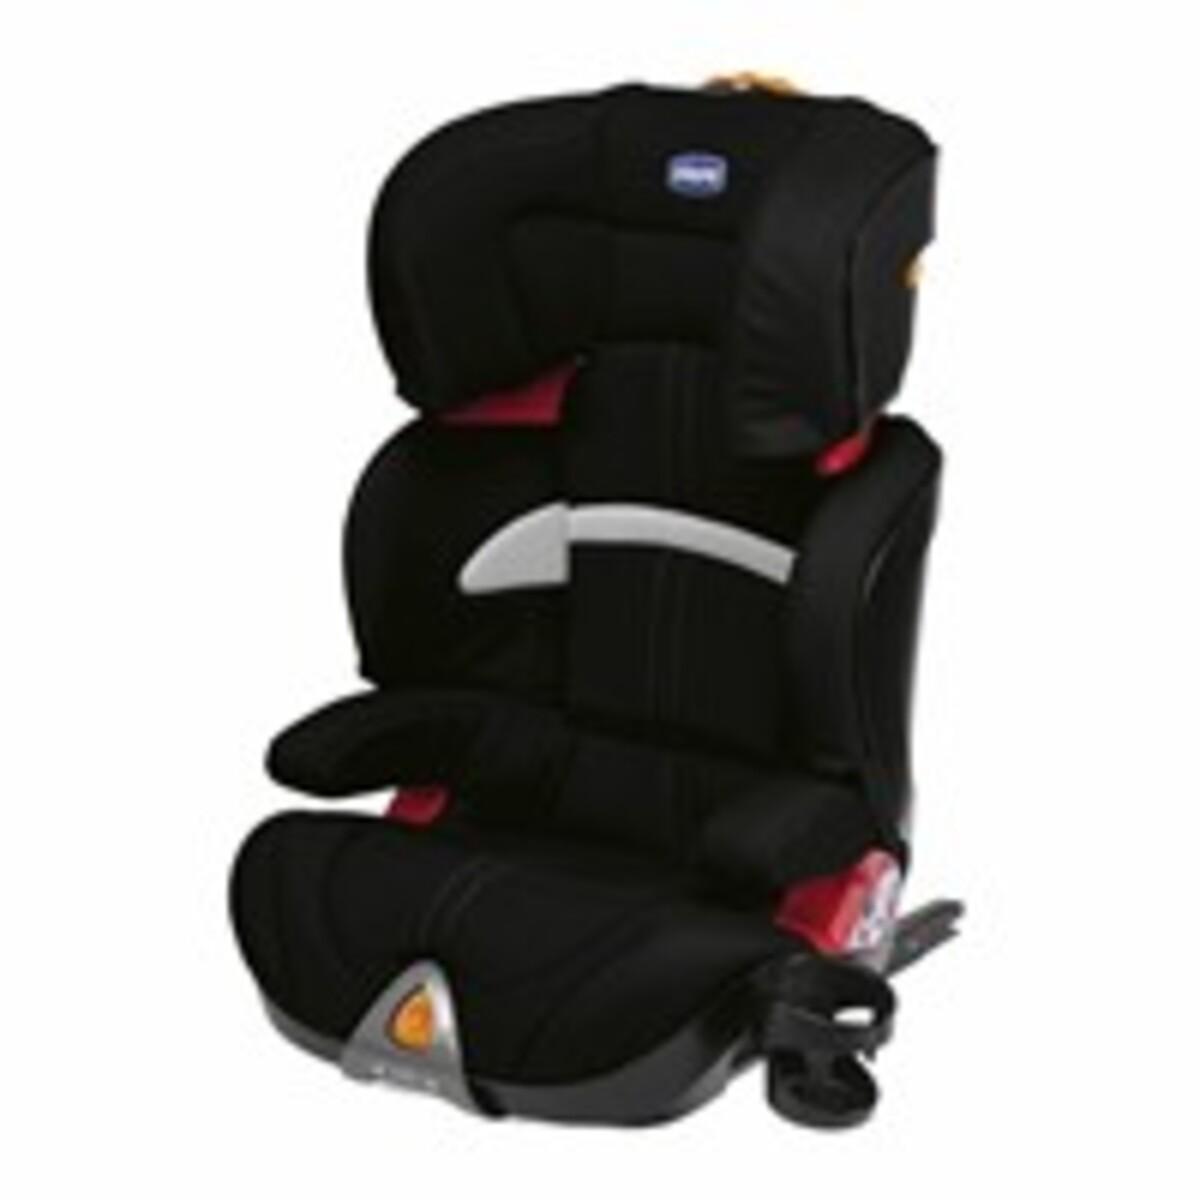 Bild 1 von Chicco Kindersitz Oasys FixPlus Black    Gr. 2/3